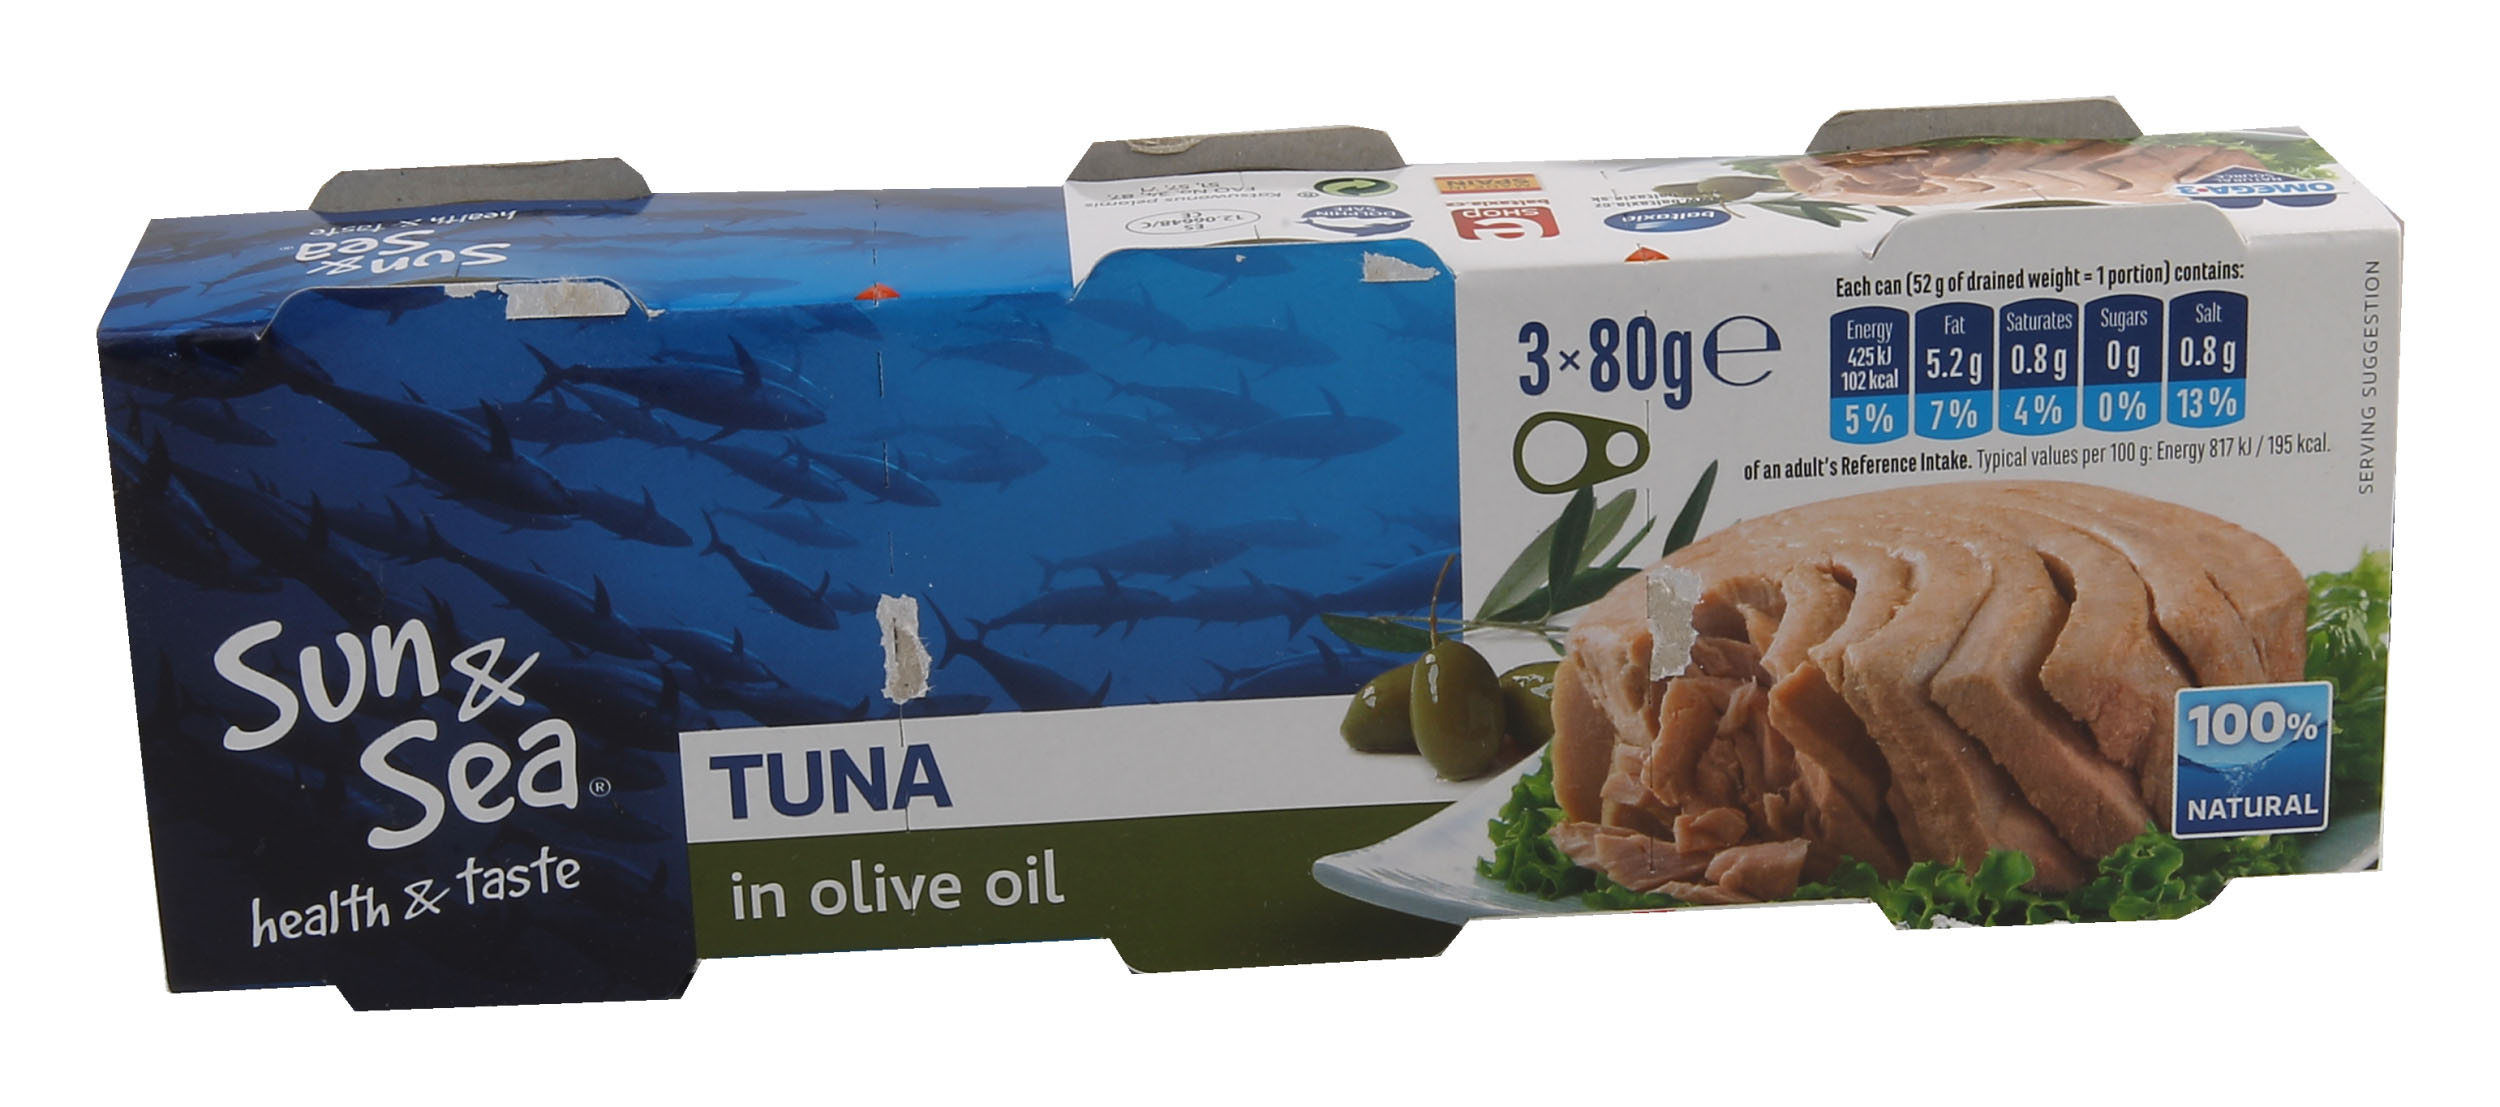 Tuňák volivovém oleji 3x80g Sun&Sea